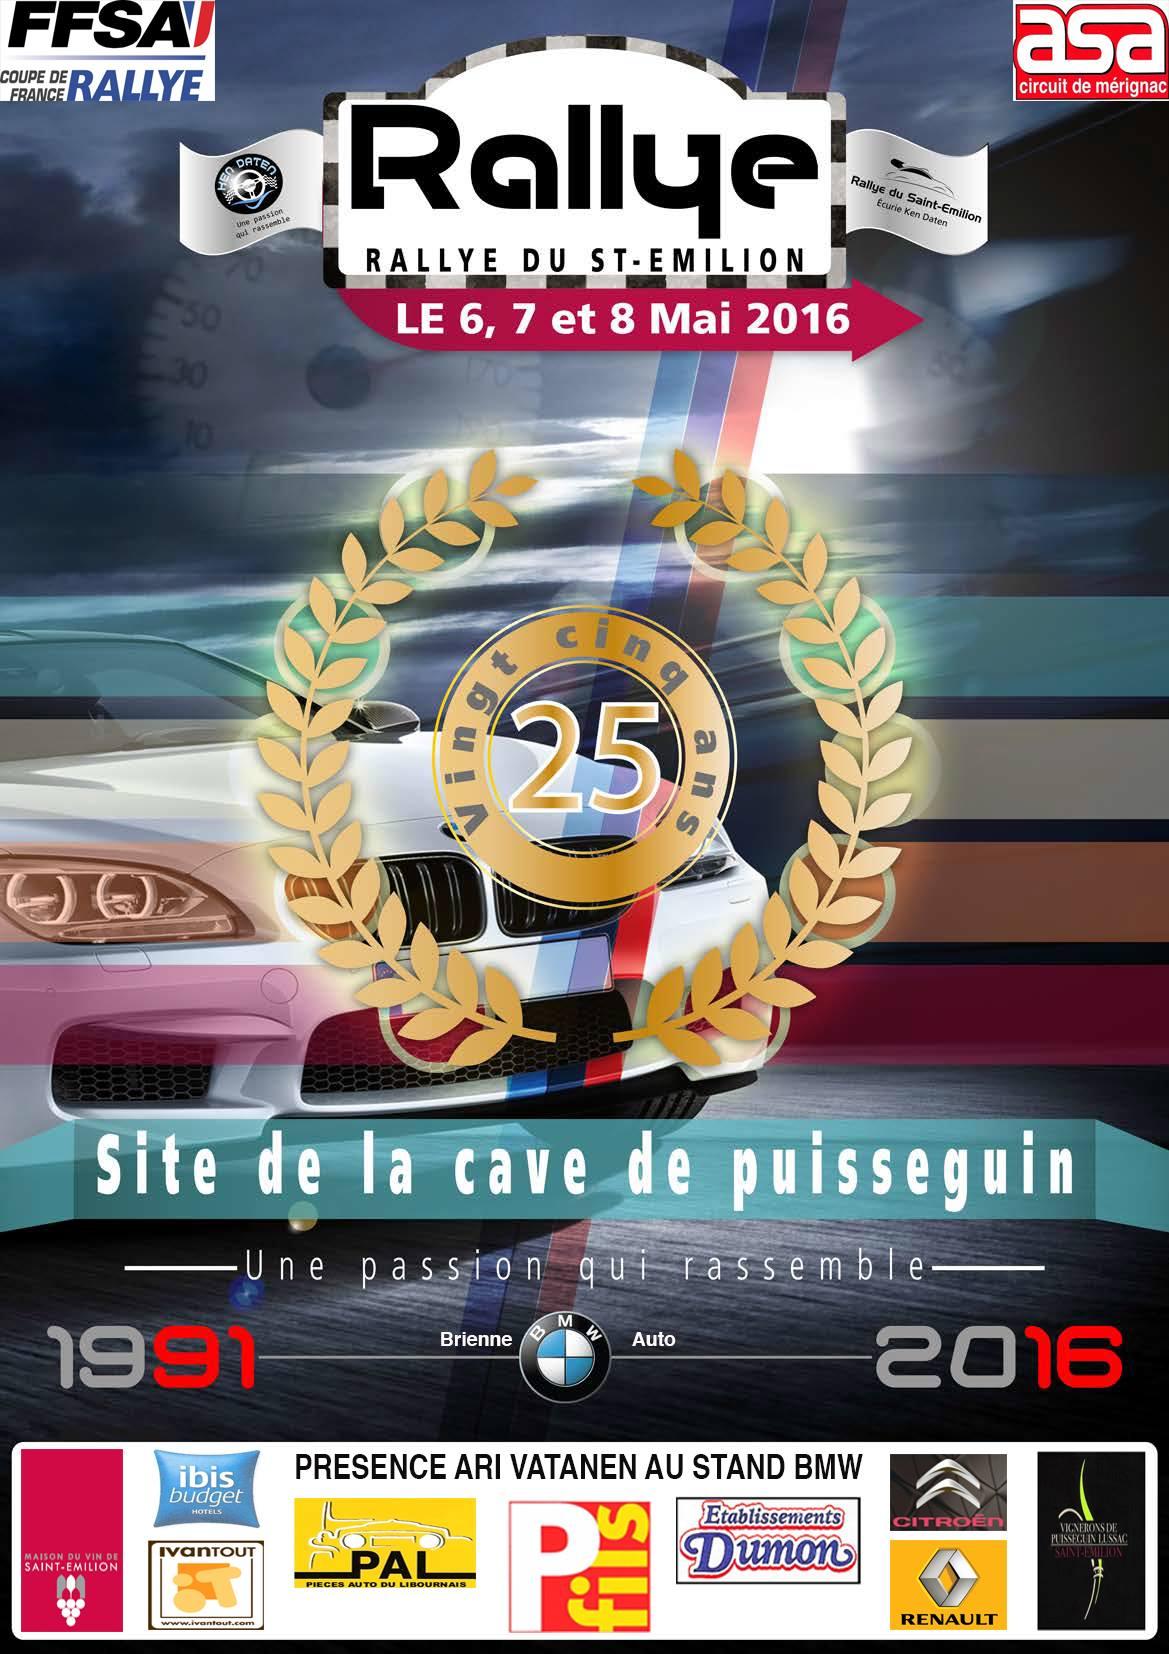 Rallye St Emilion 2016